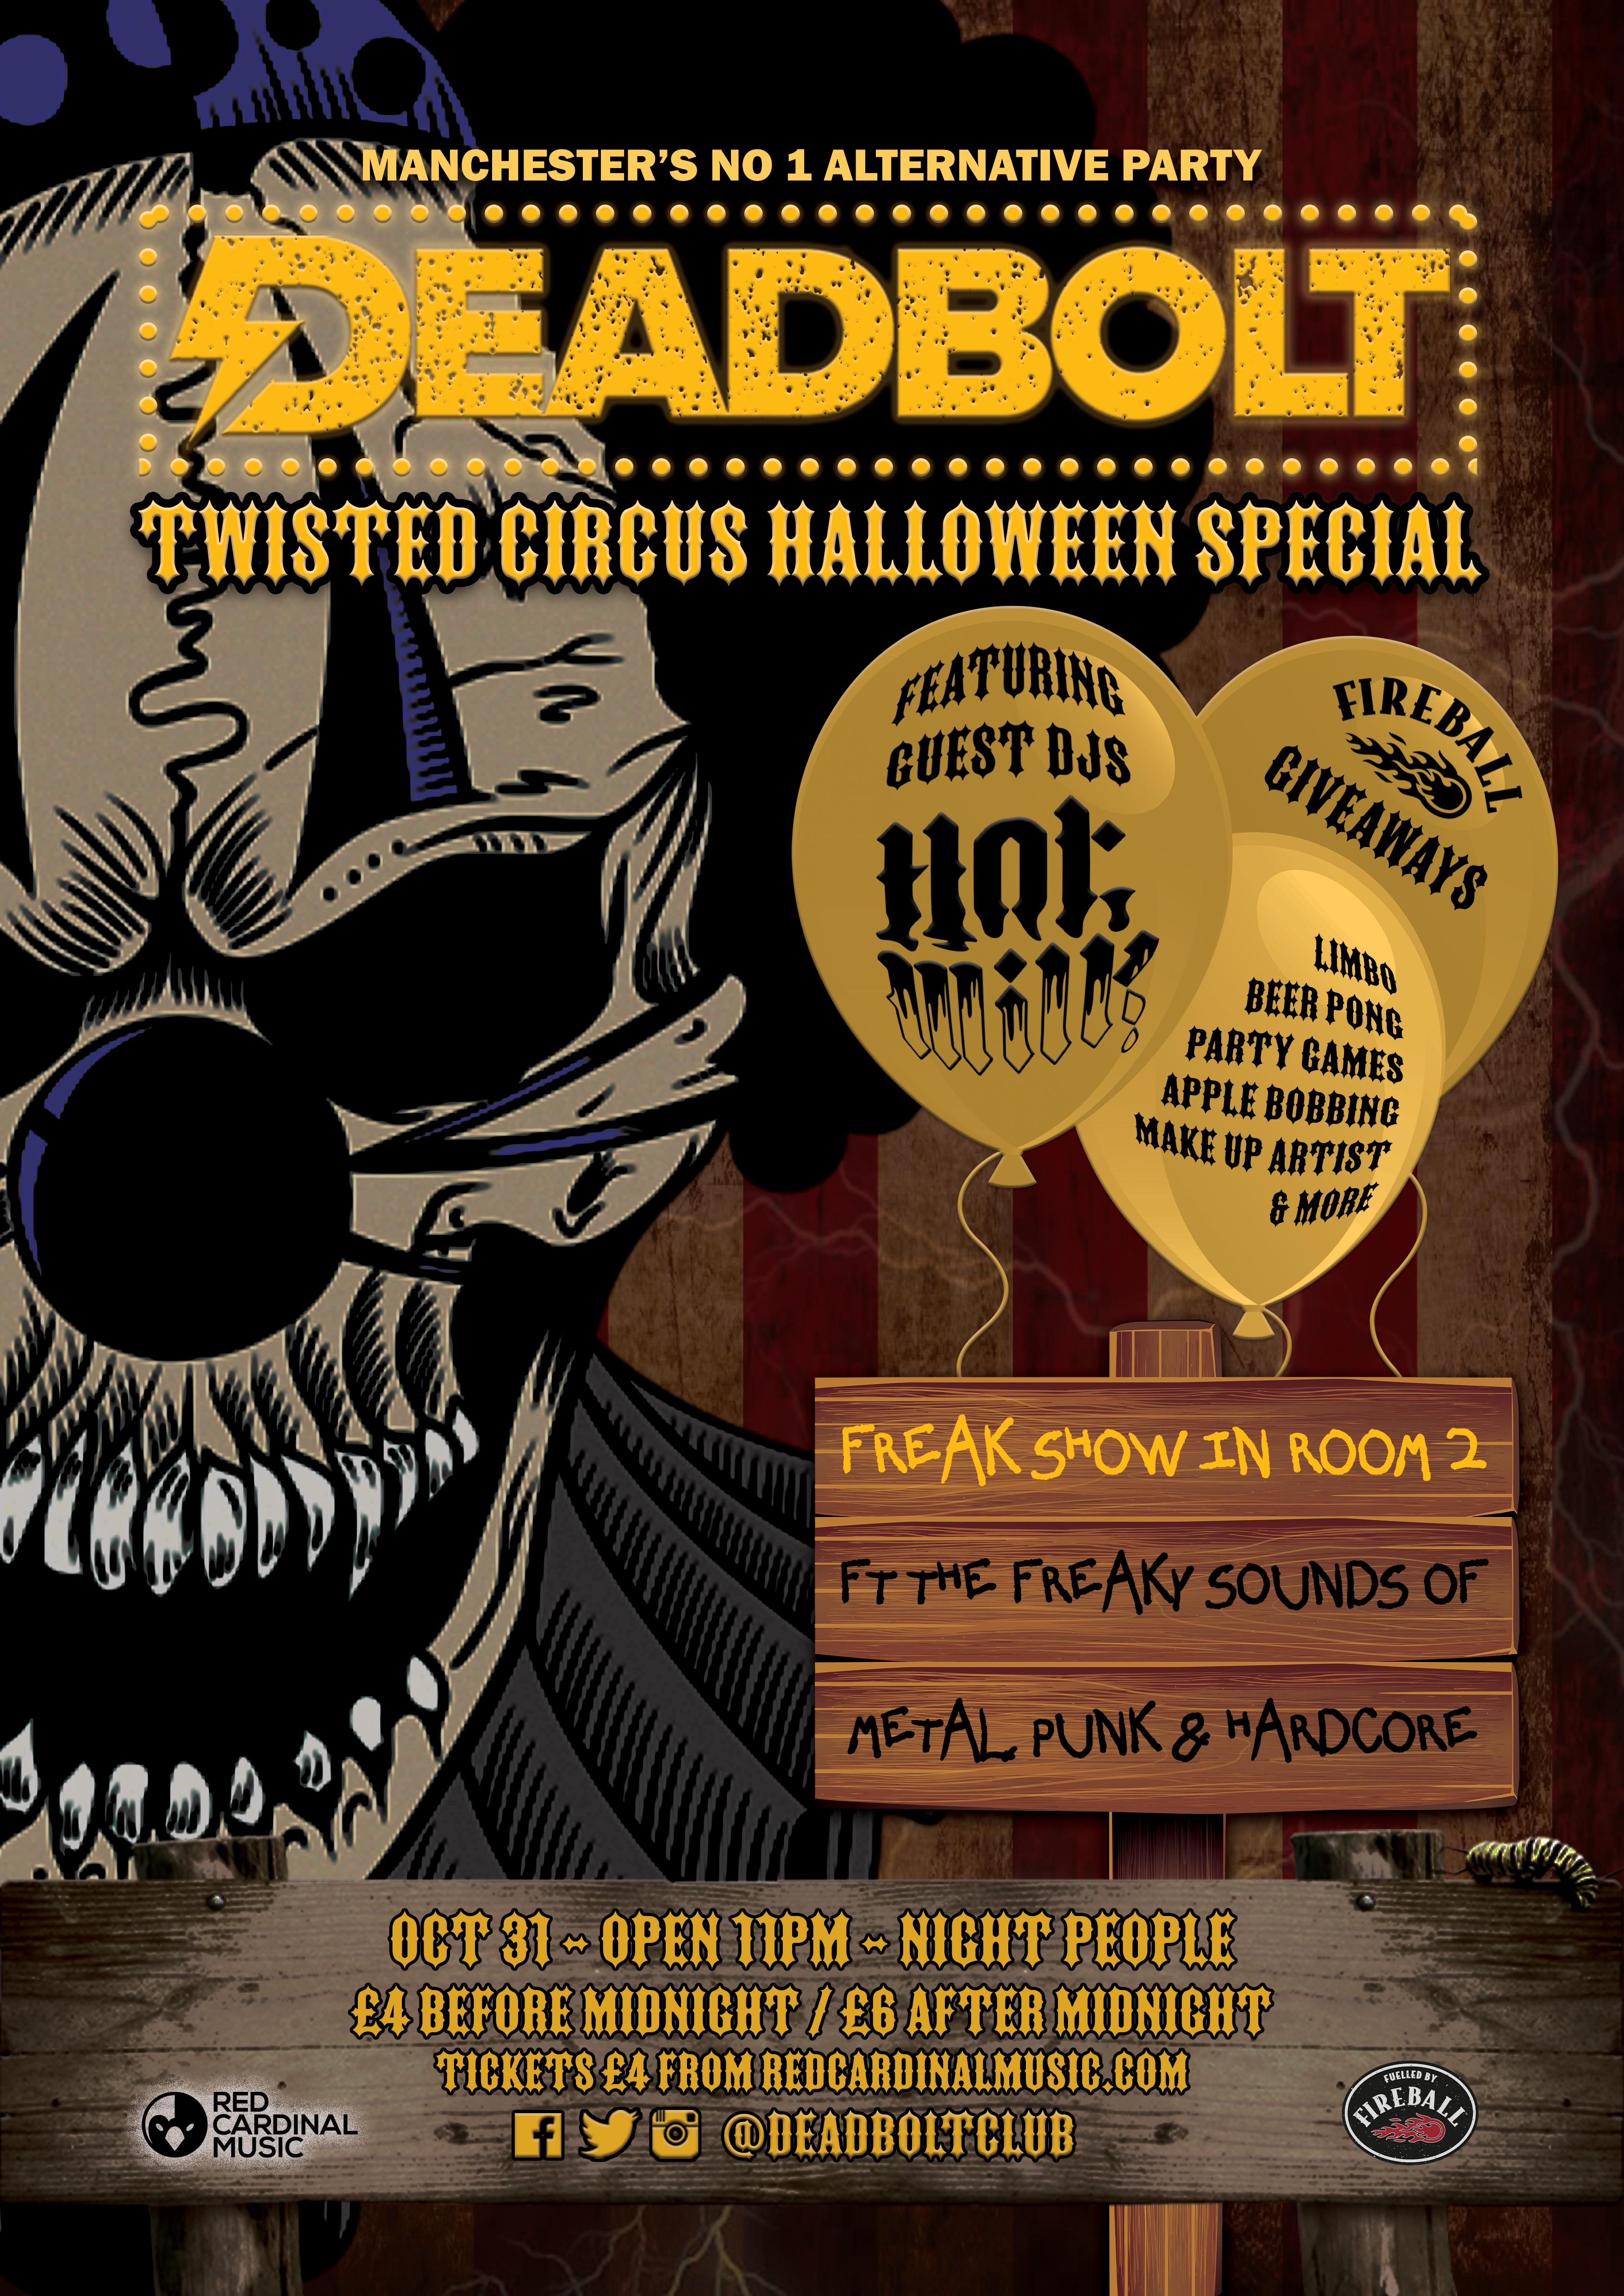 Deadbolt Manchester Alternative Halloween 2019 - Poster - Red Cardinal Music - Rock Emo Metal Night People